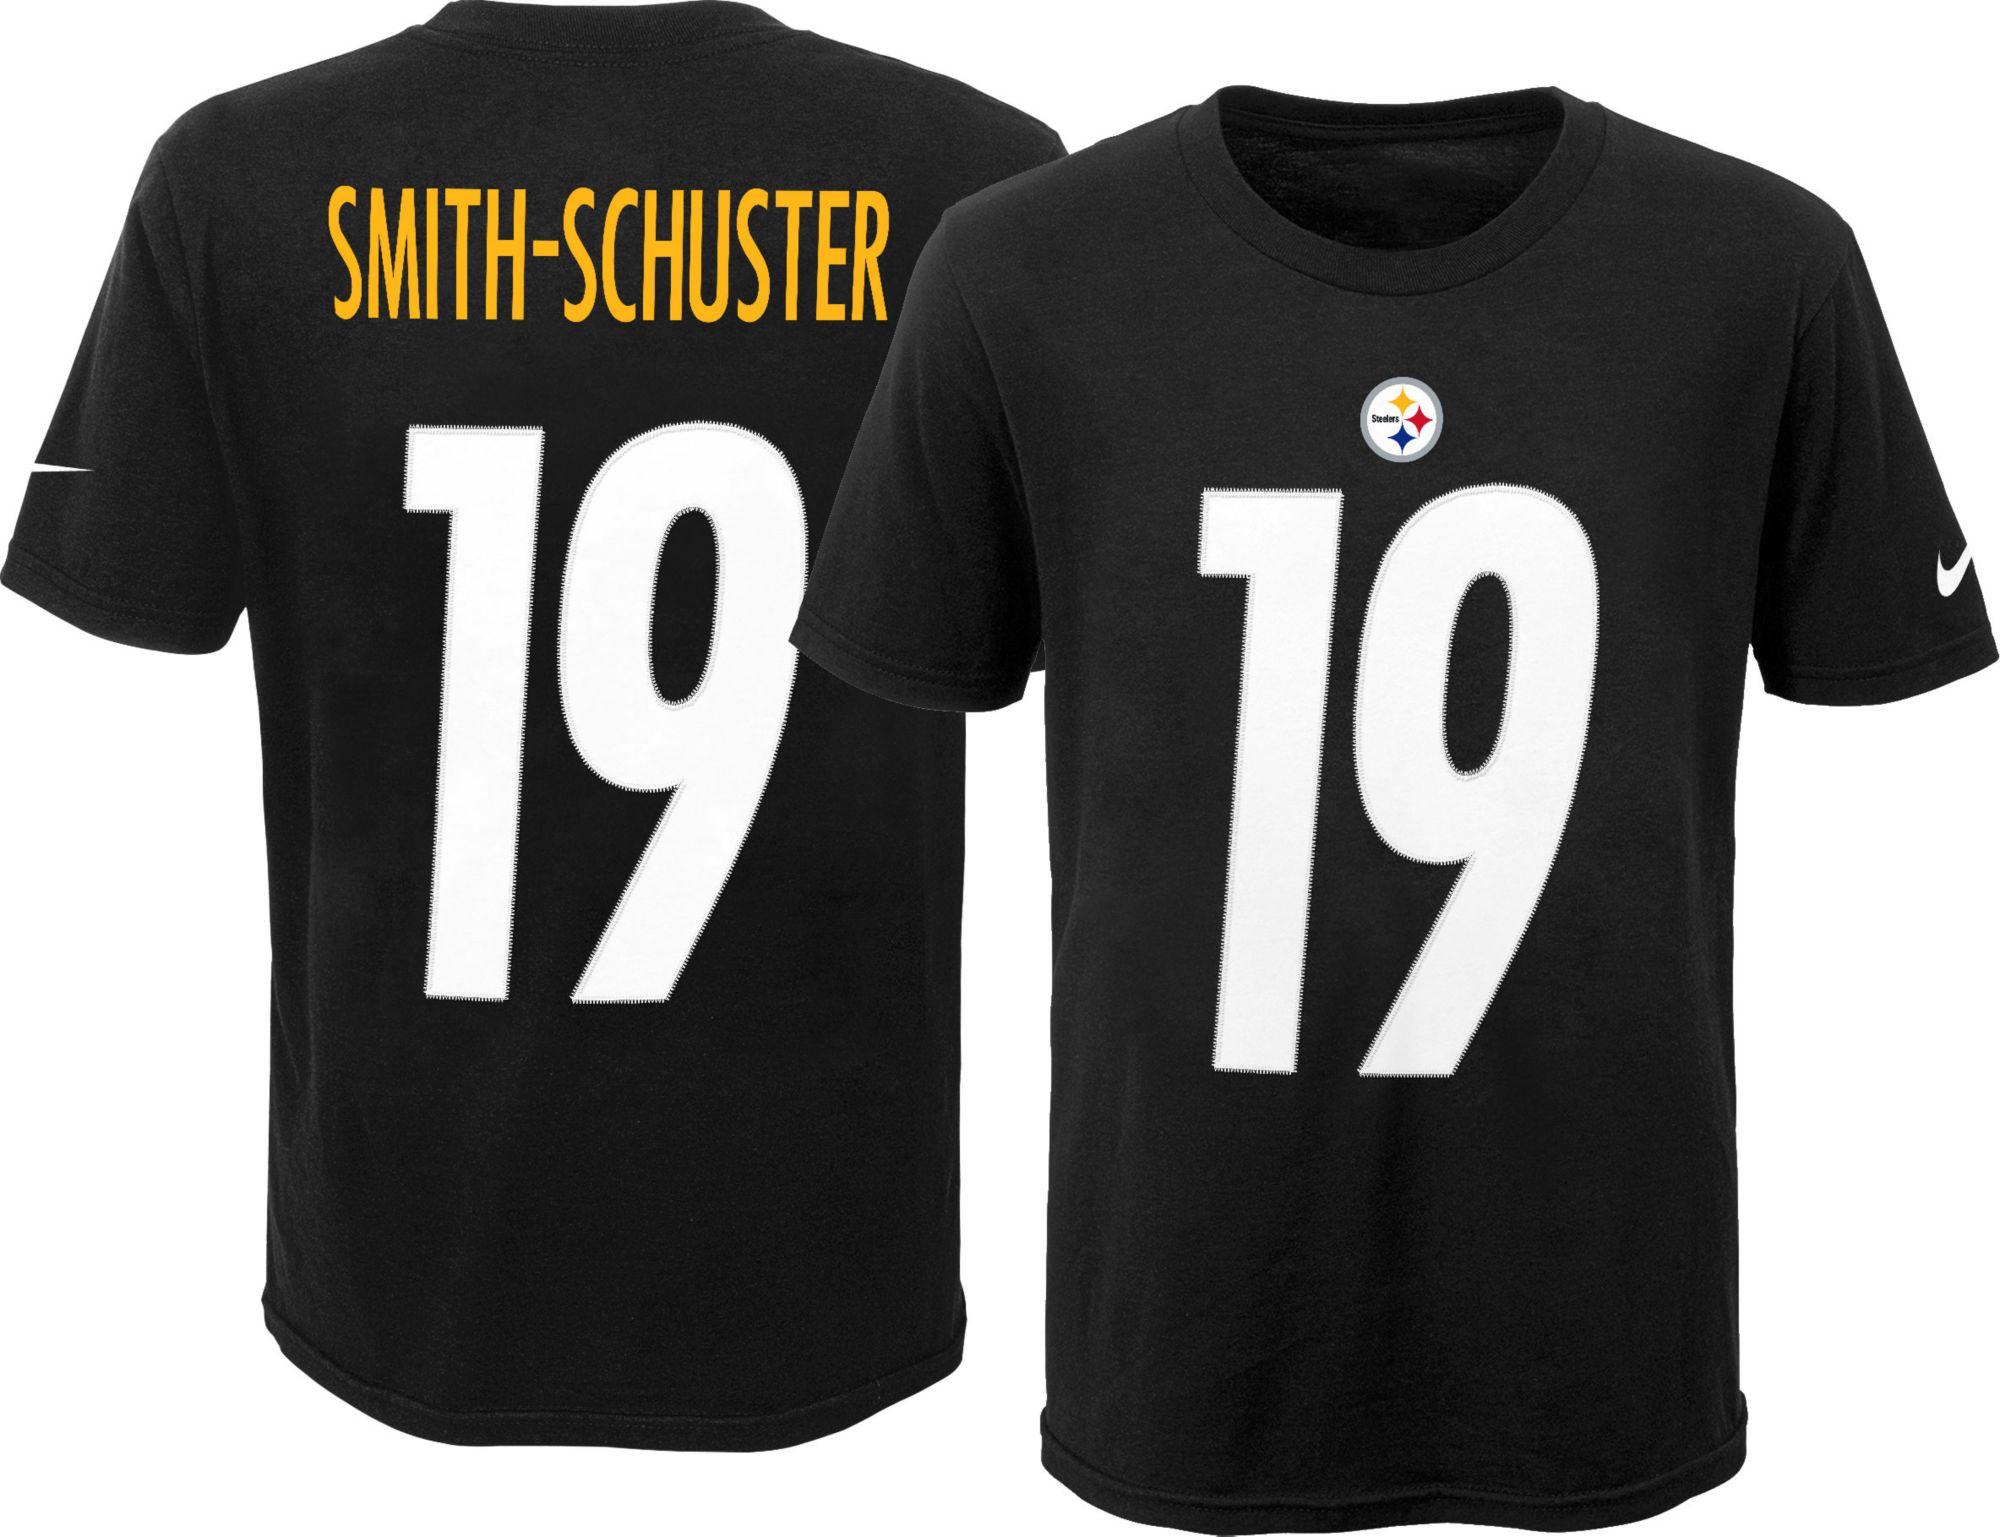 juju smith schuster toddler jersey